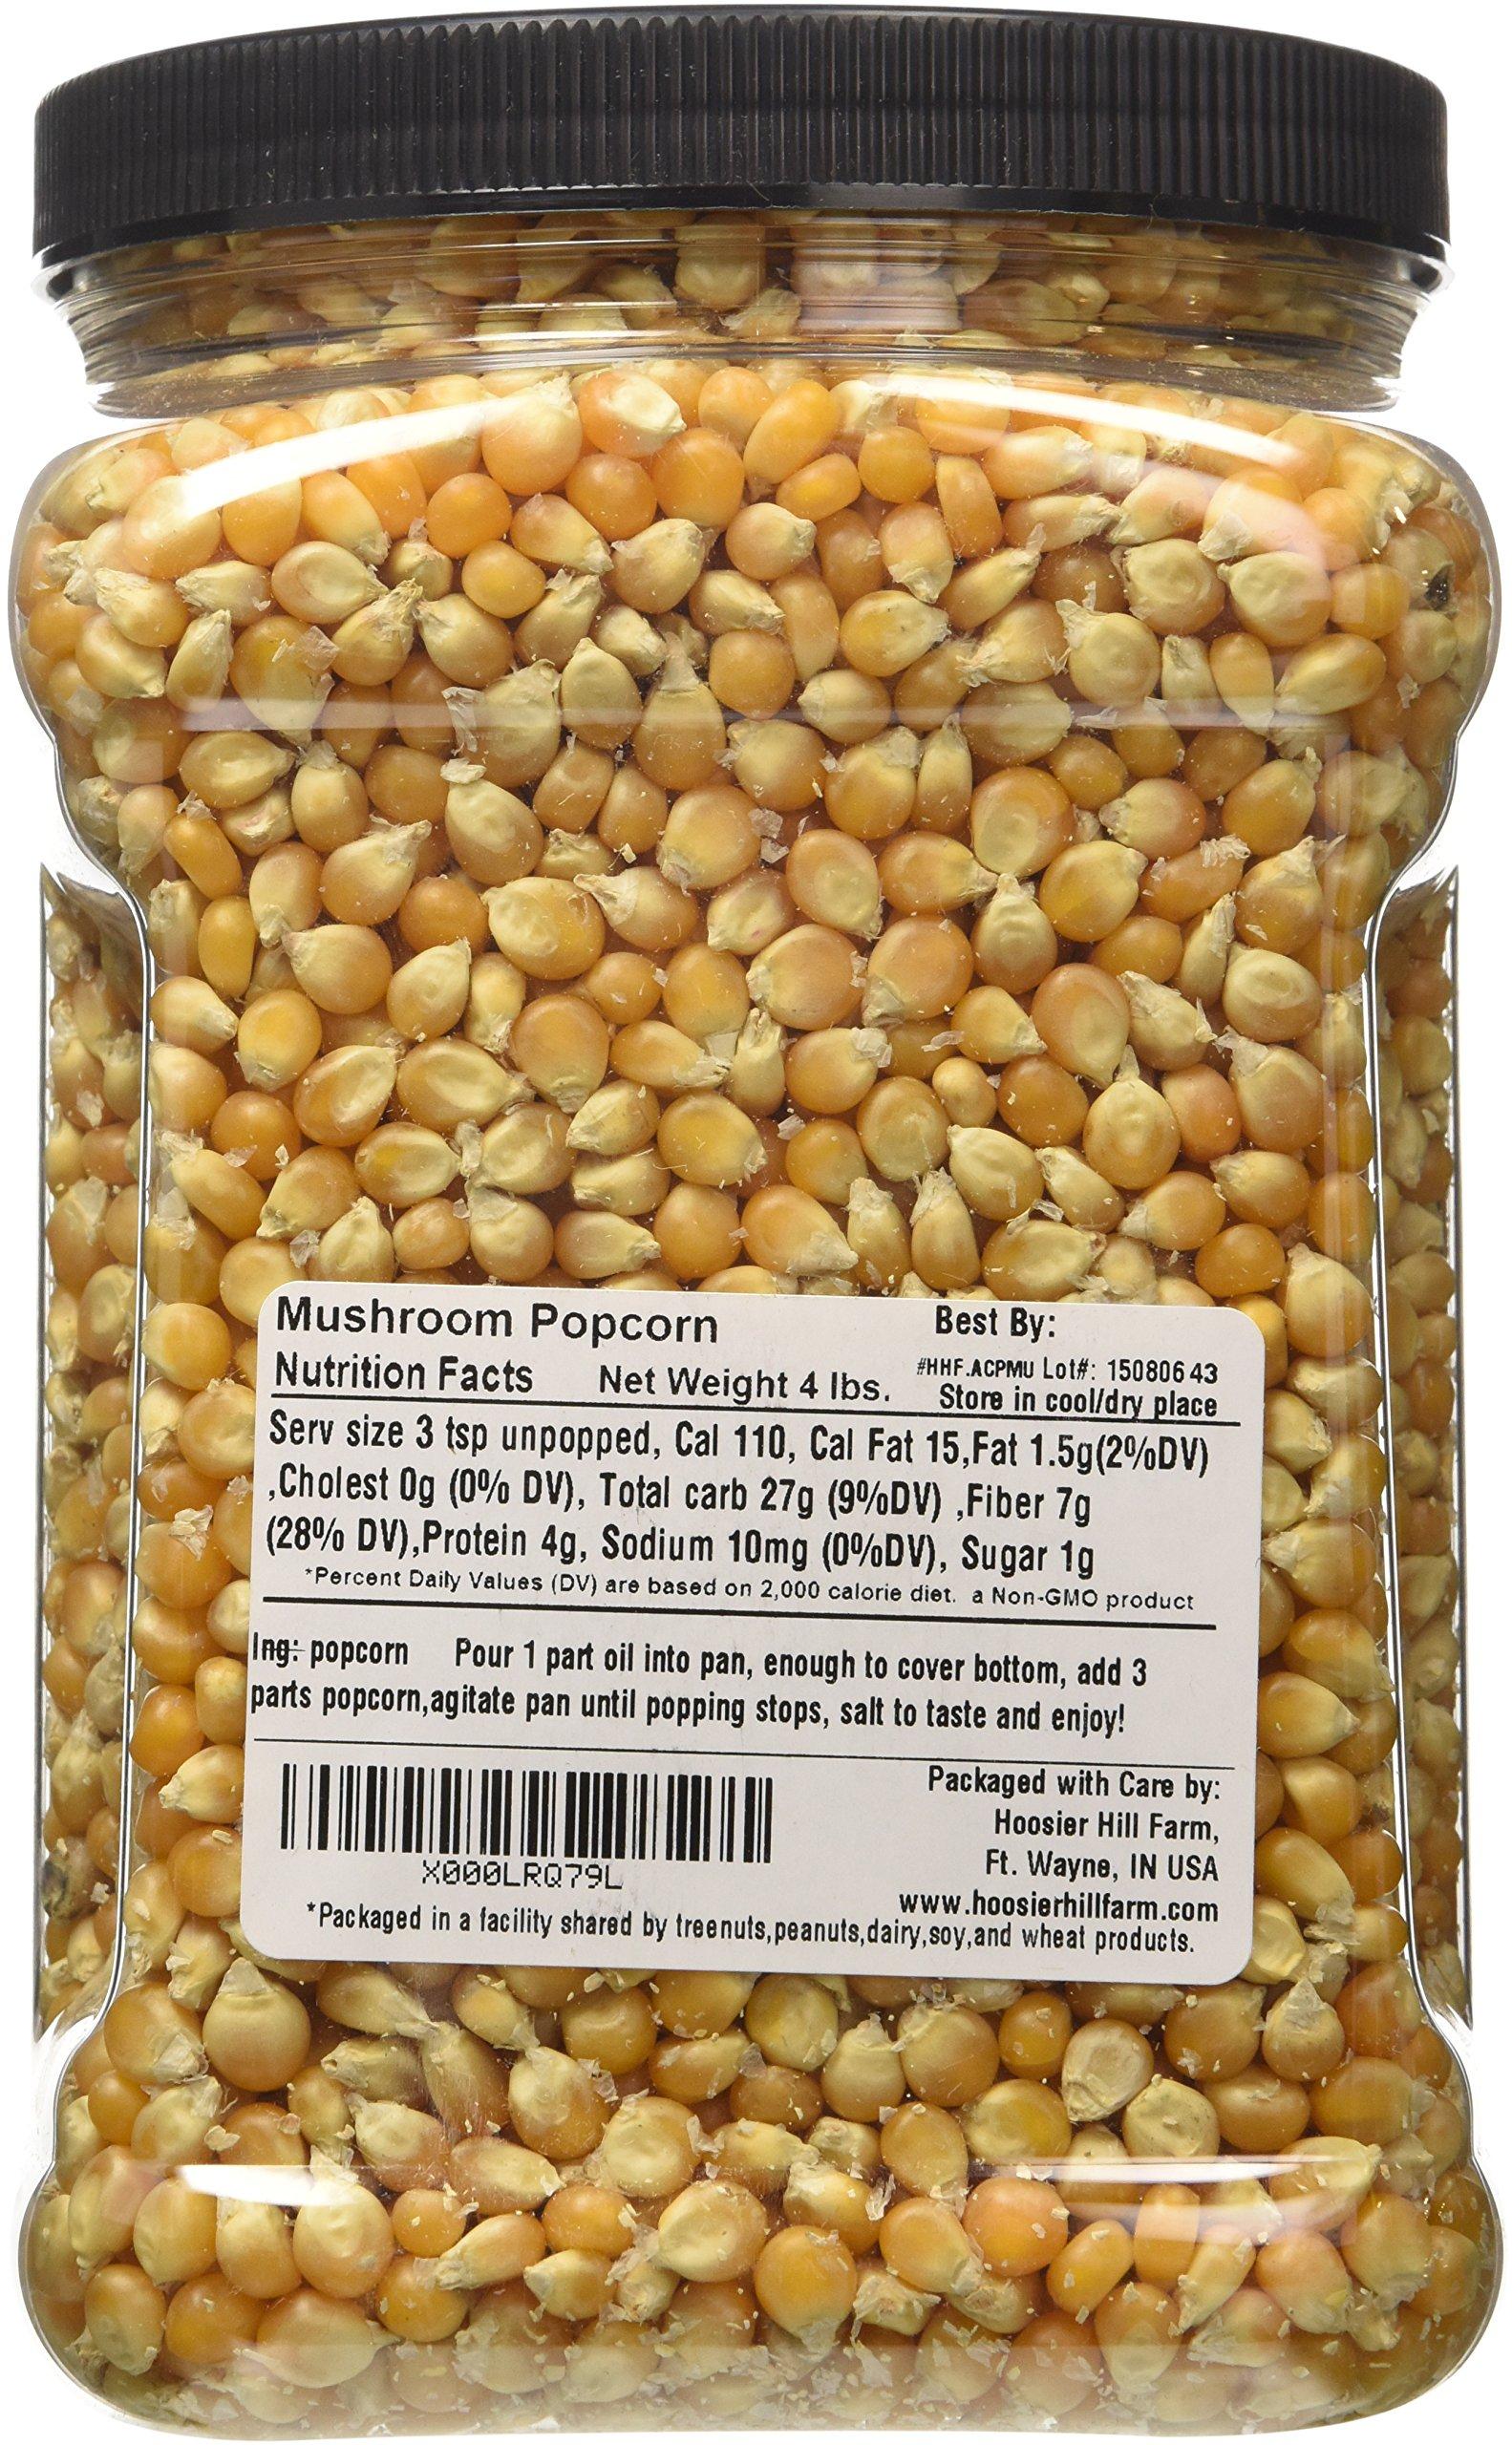 Hoosier Hill Farm Gourmet Mushroom NON-GMO Popcorn Lovers, 4 Pound by Hoosier Hill Farm